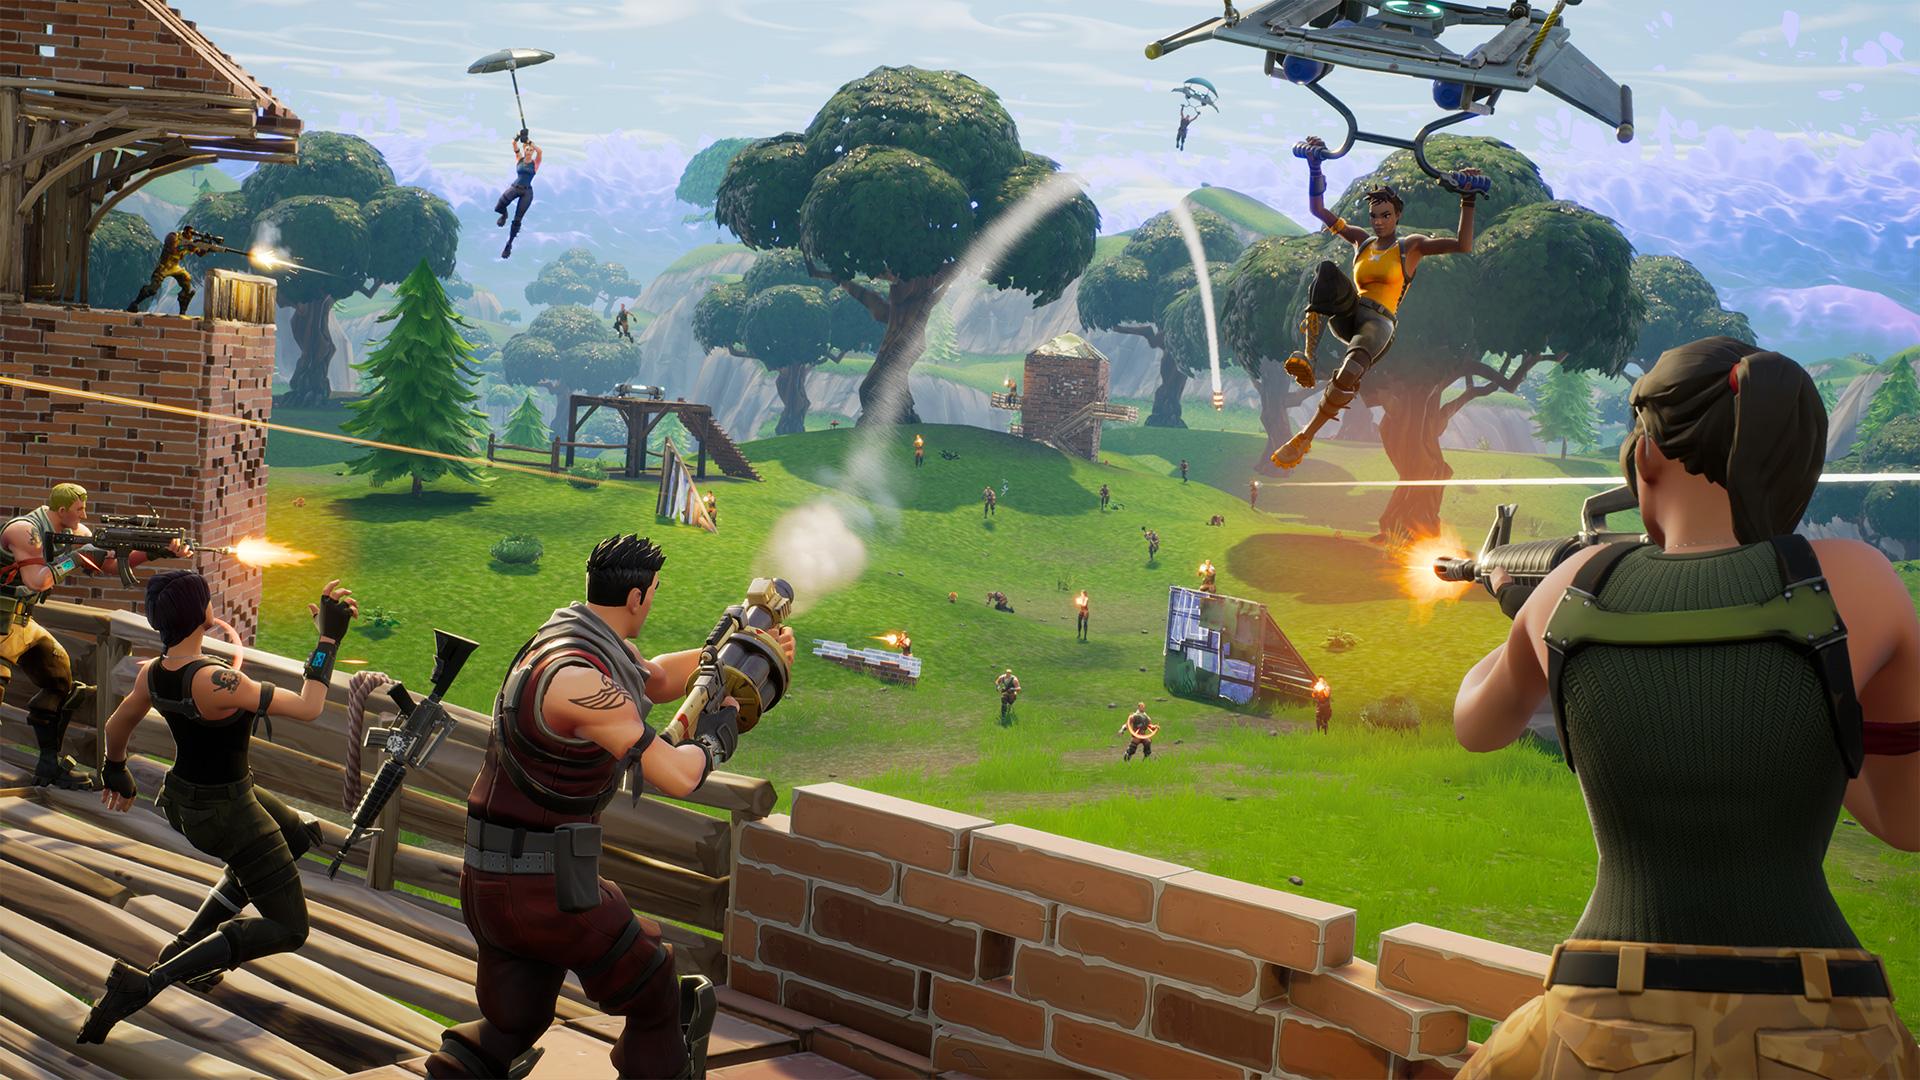 Wccftech's Best Multiplayer Games of 2017 - Enter Battle Royale